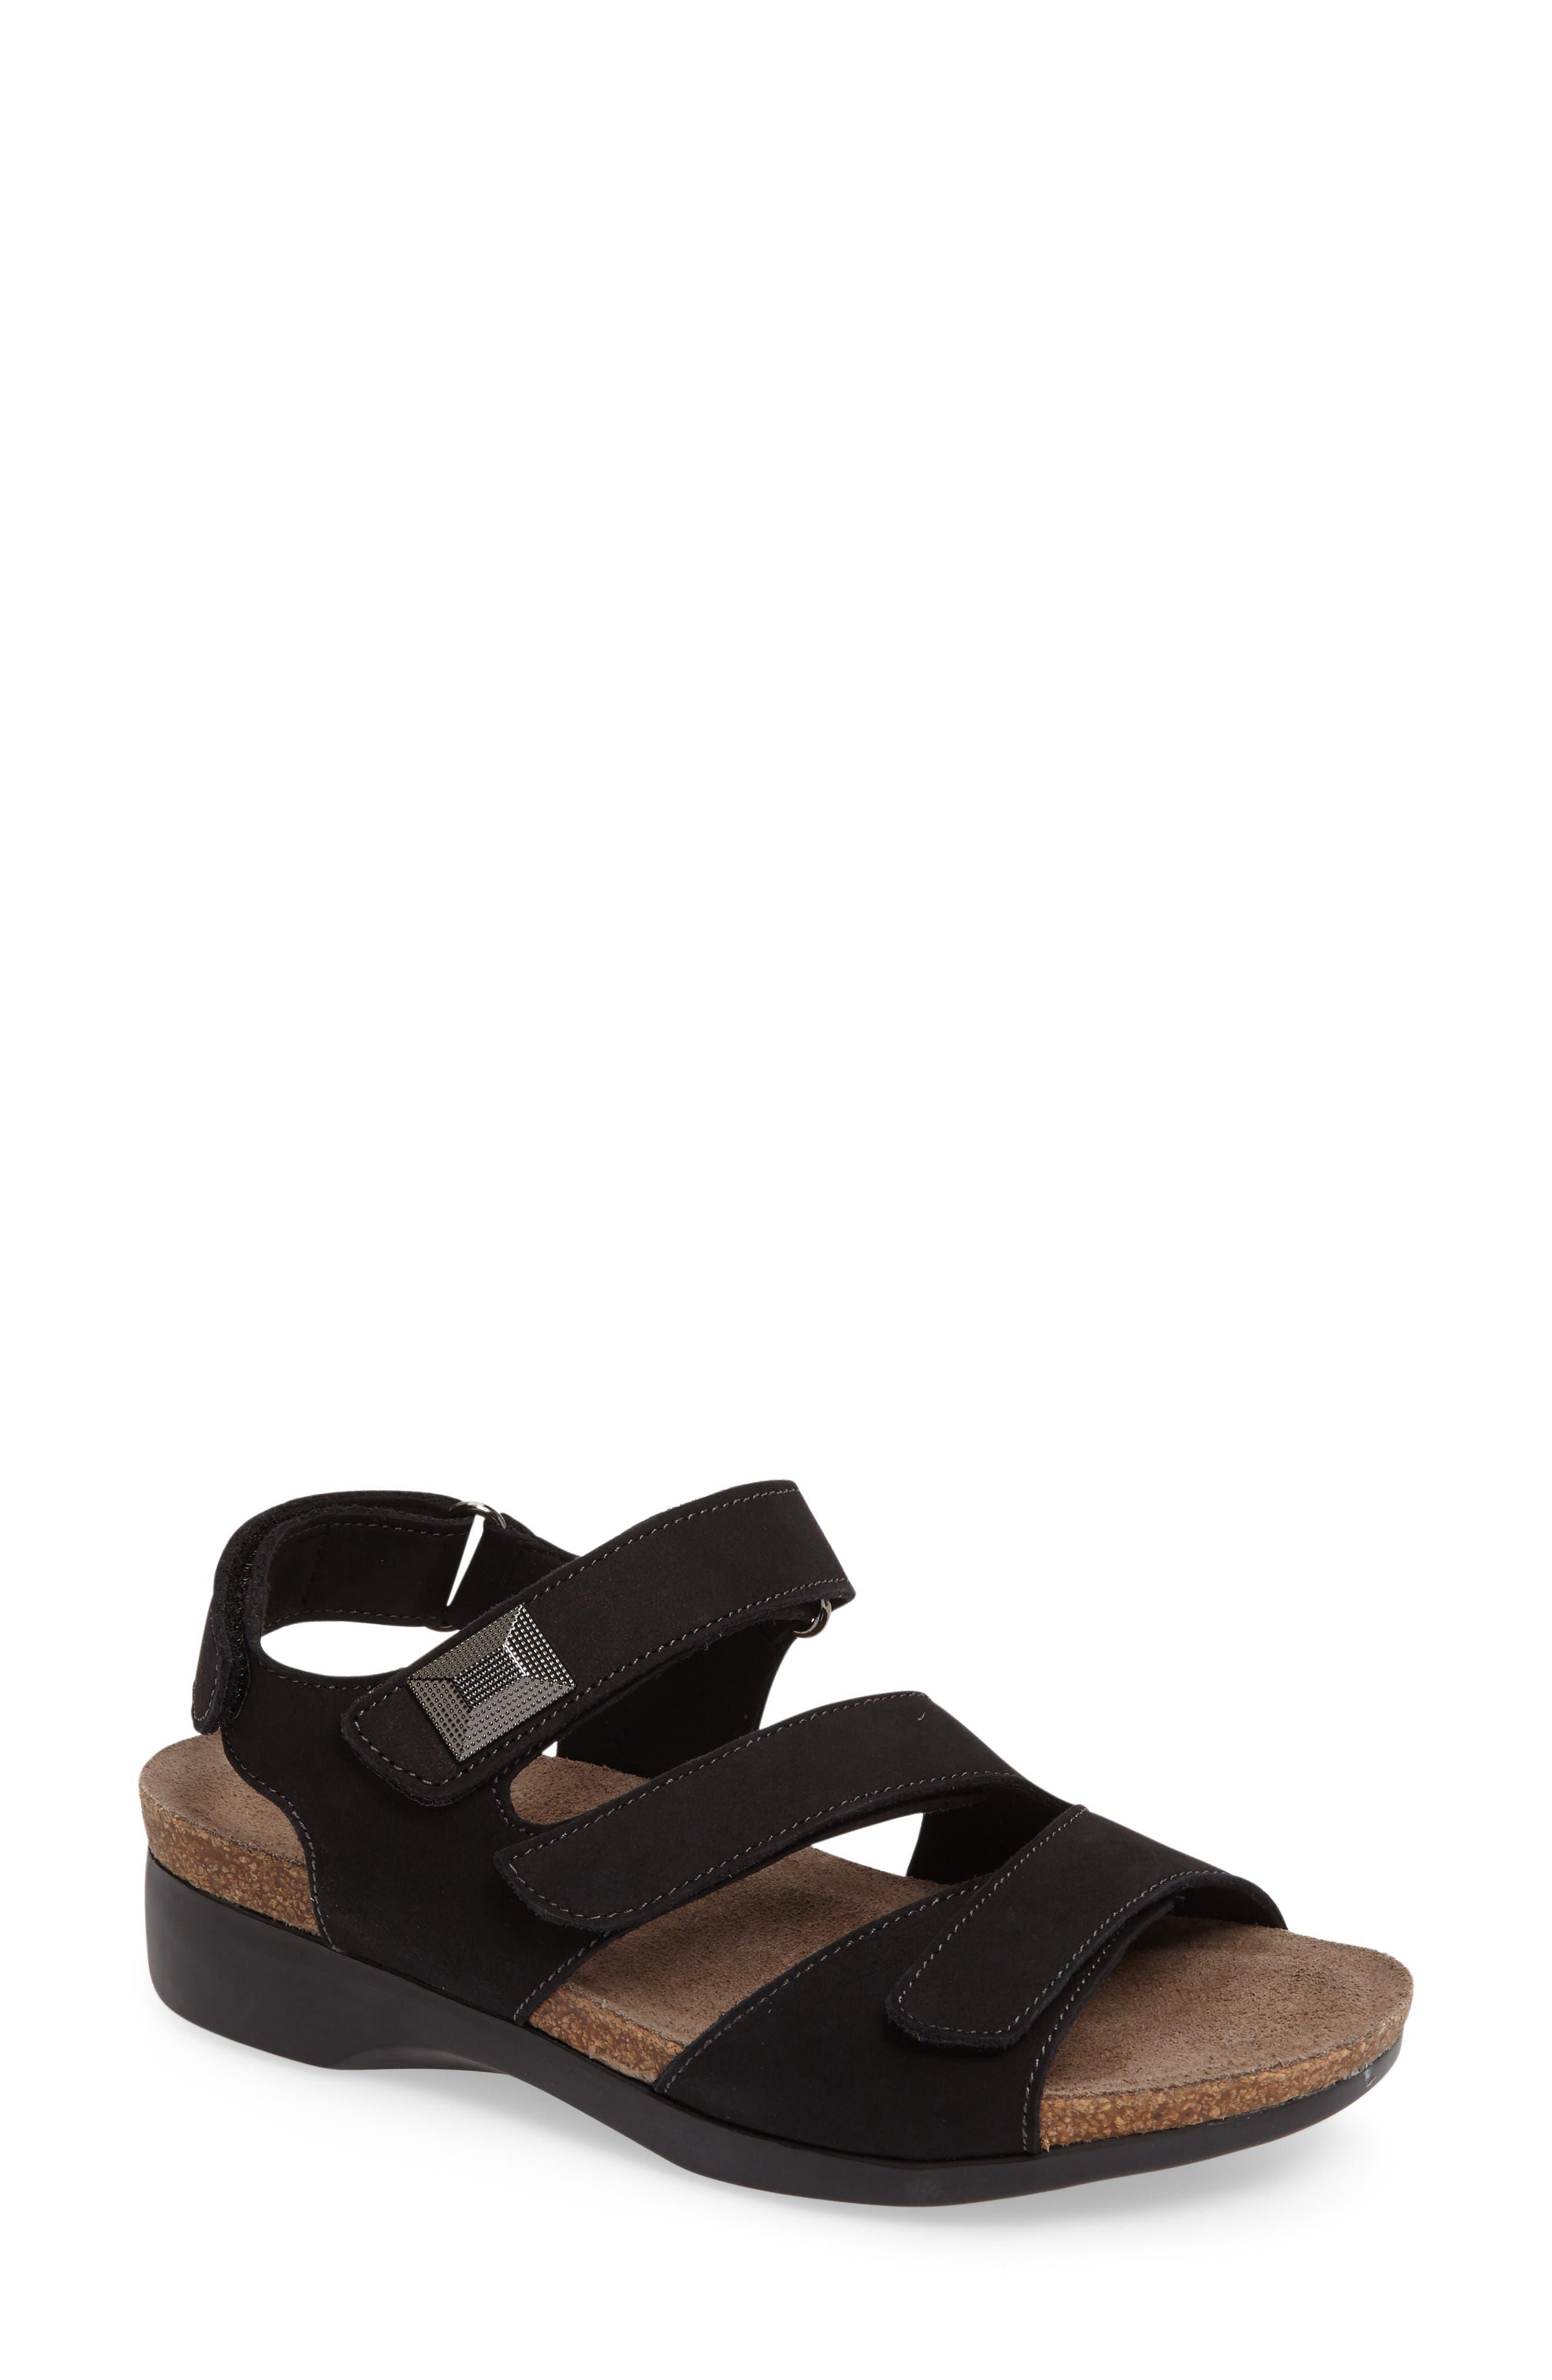 MUNRO Antila Sandal, Main, color, BLACK